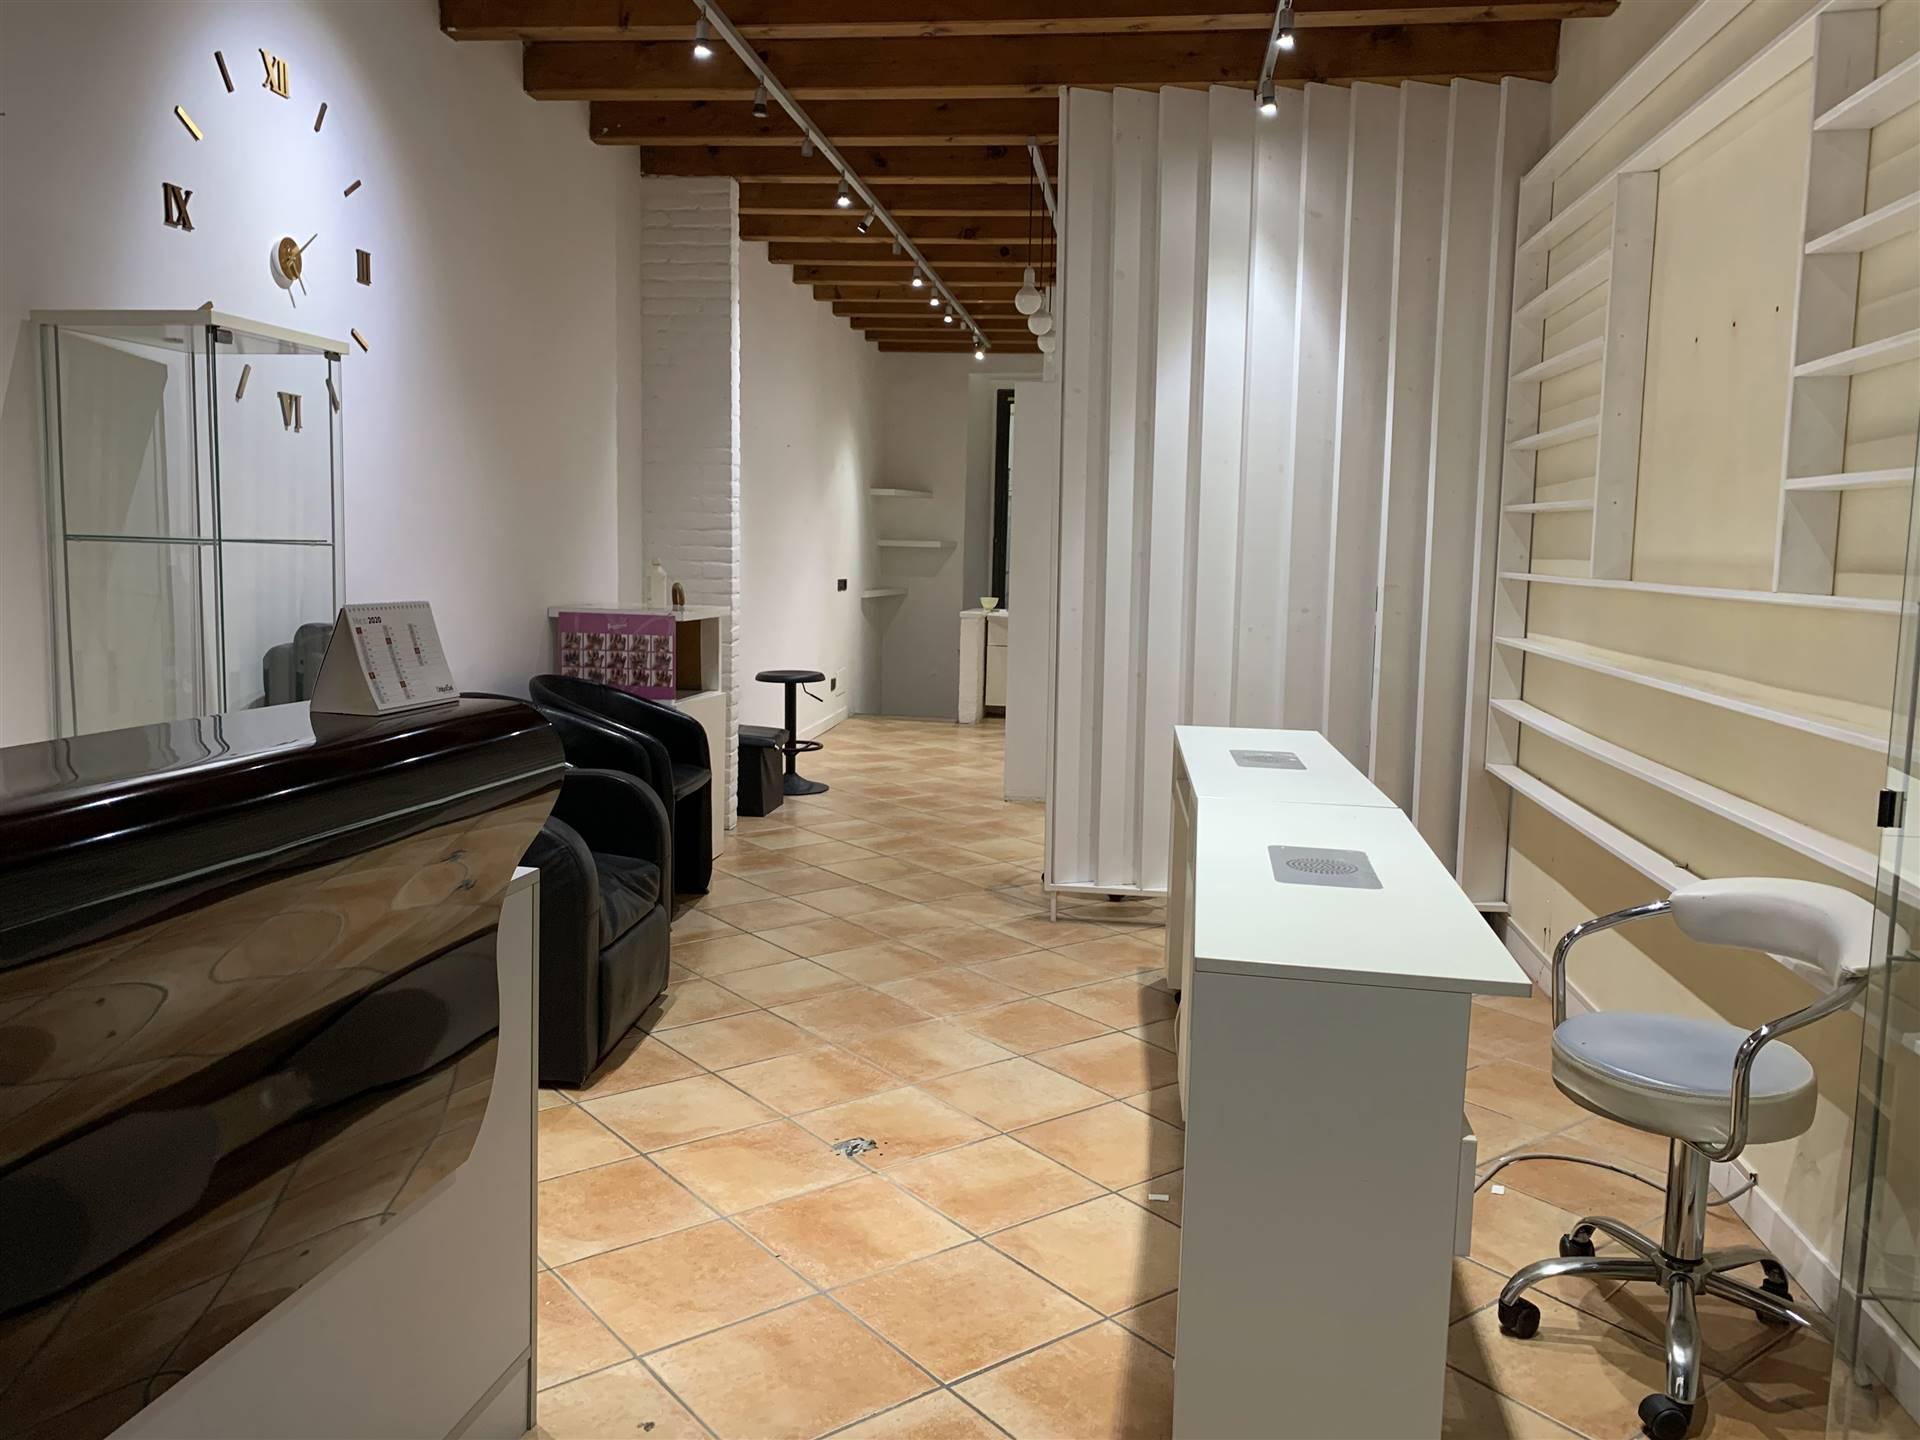 Immobile Commerciale in Affitto a Mantova